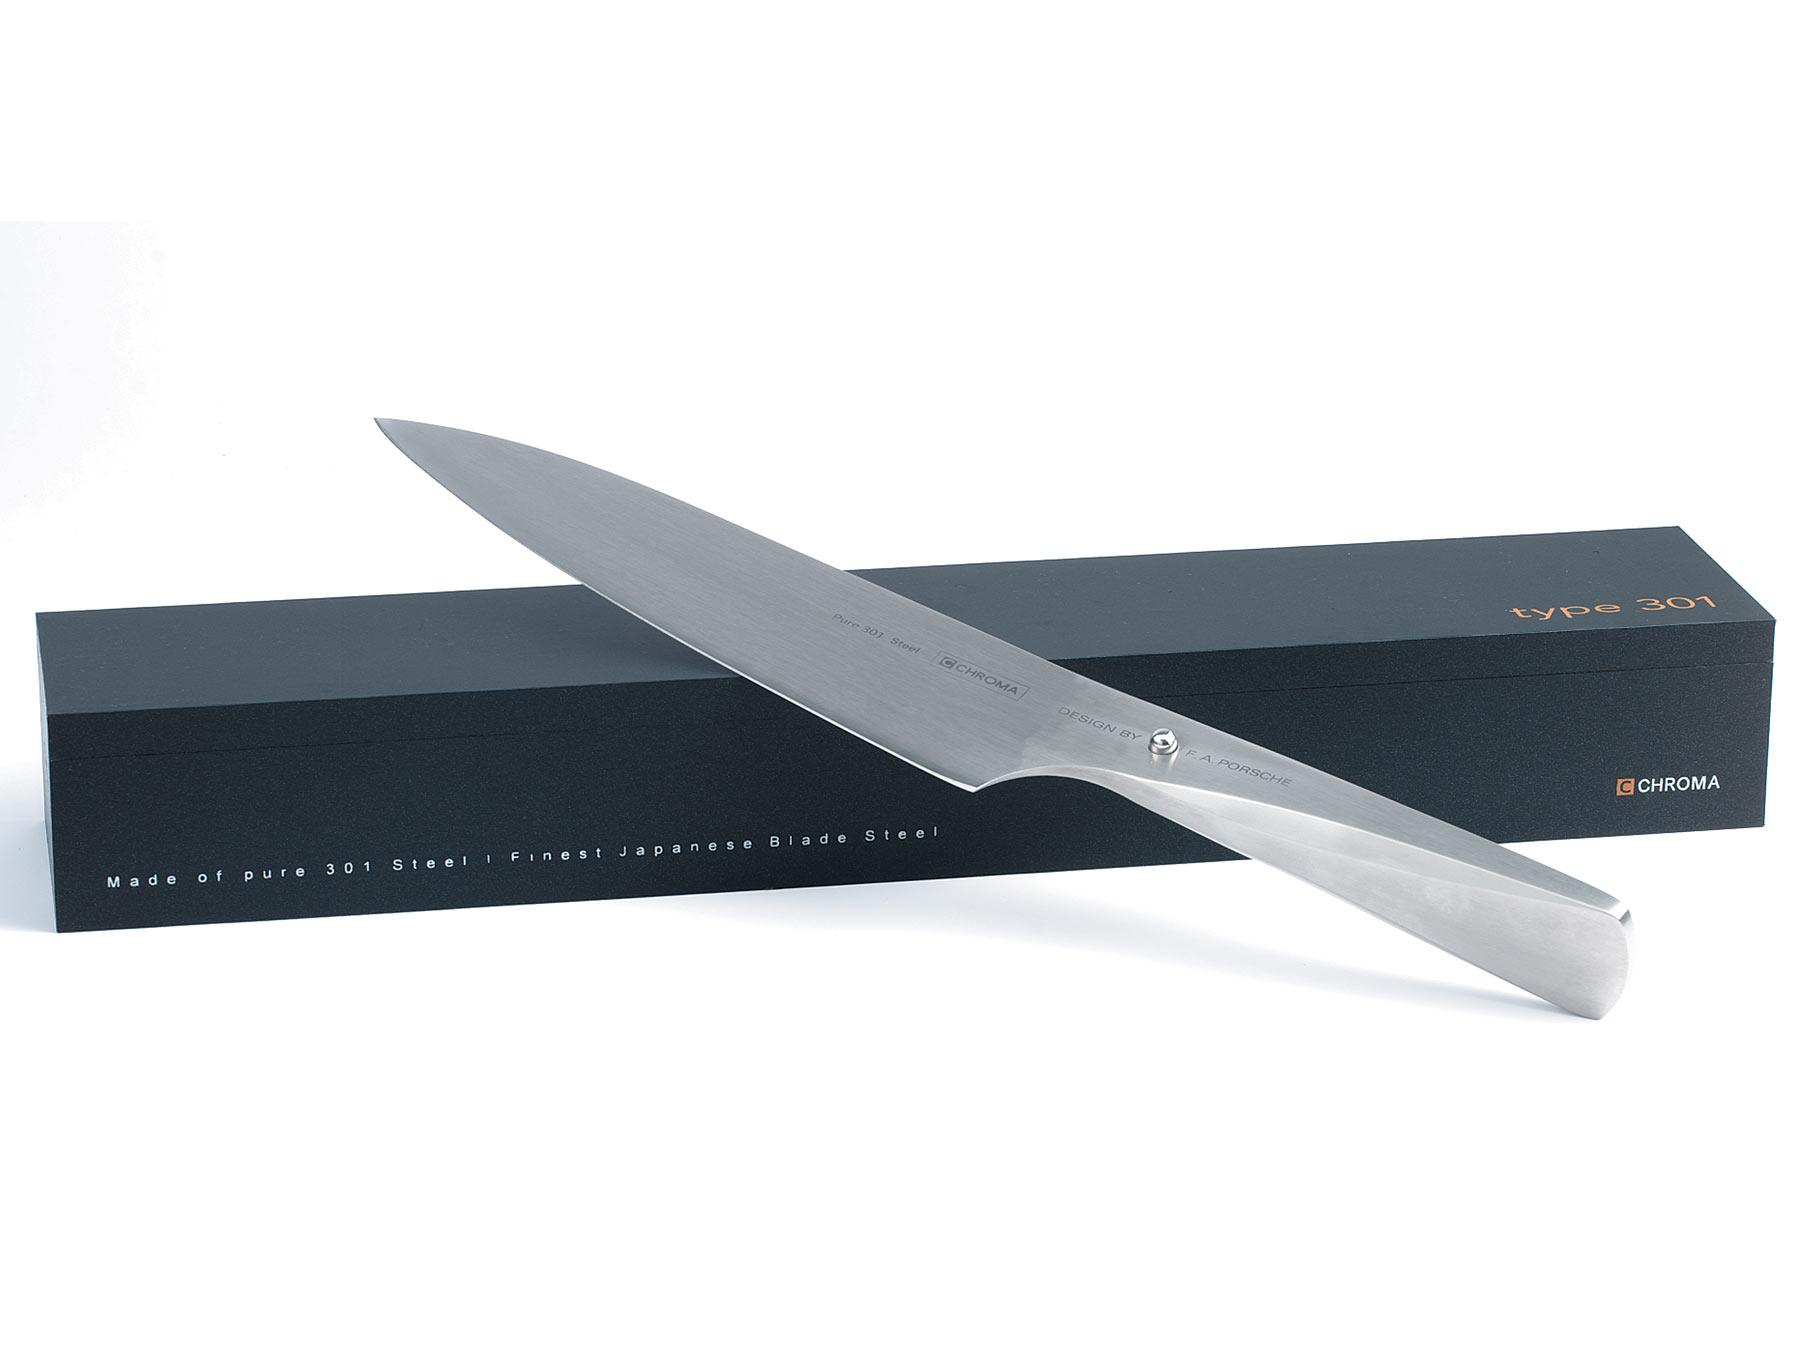 Chroma Type 301 P08 Ausbeinmesser 14 cm